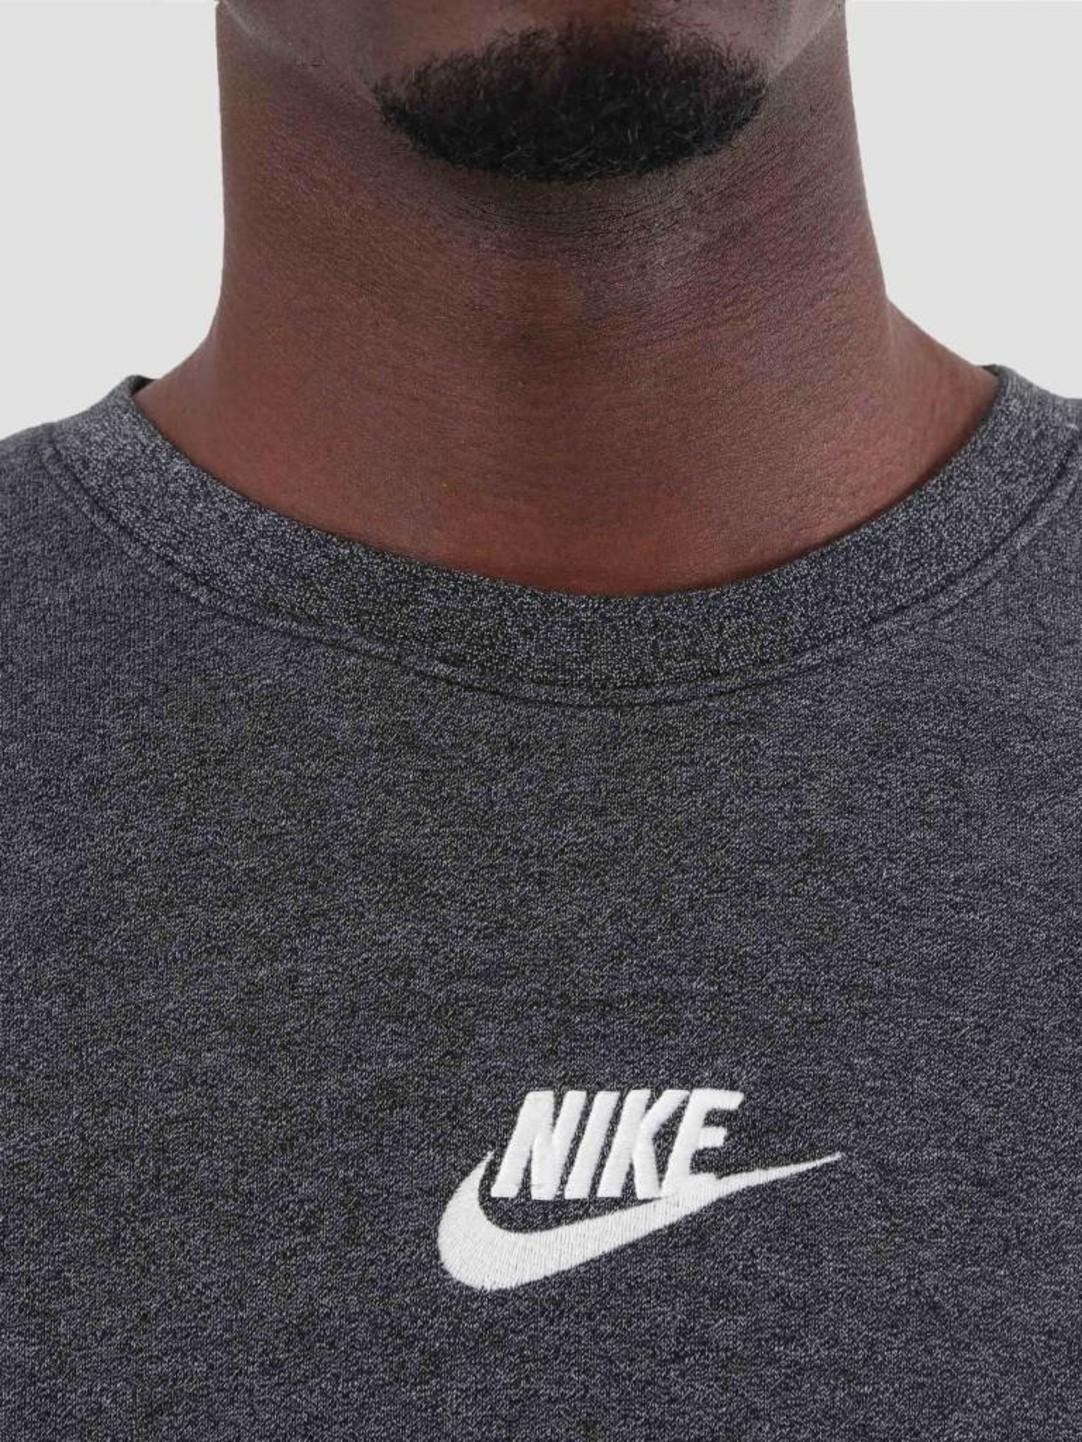 Nike Nike Sportswear Heritage Black Htr Sail 928427-010